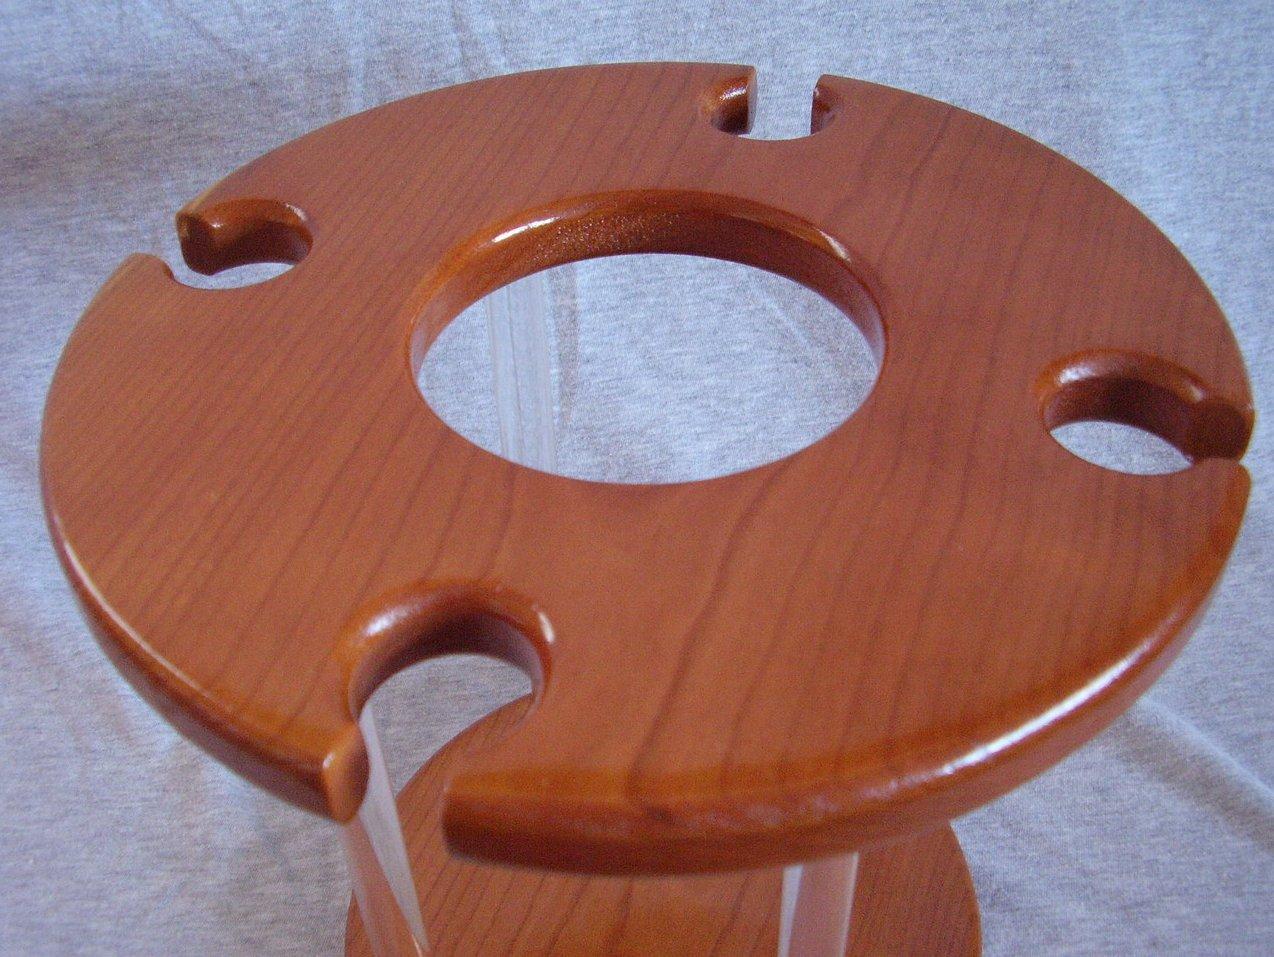 Handmade Cherry Wood & Acrylic